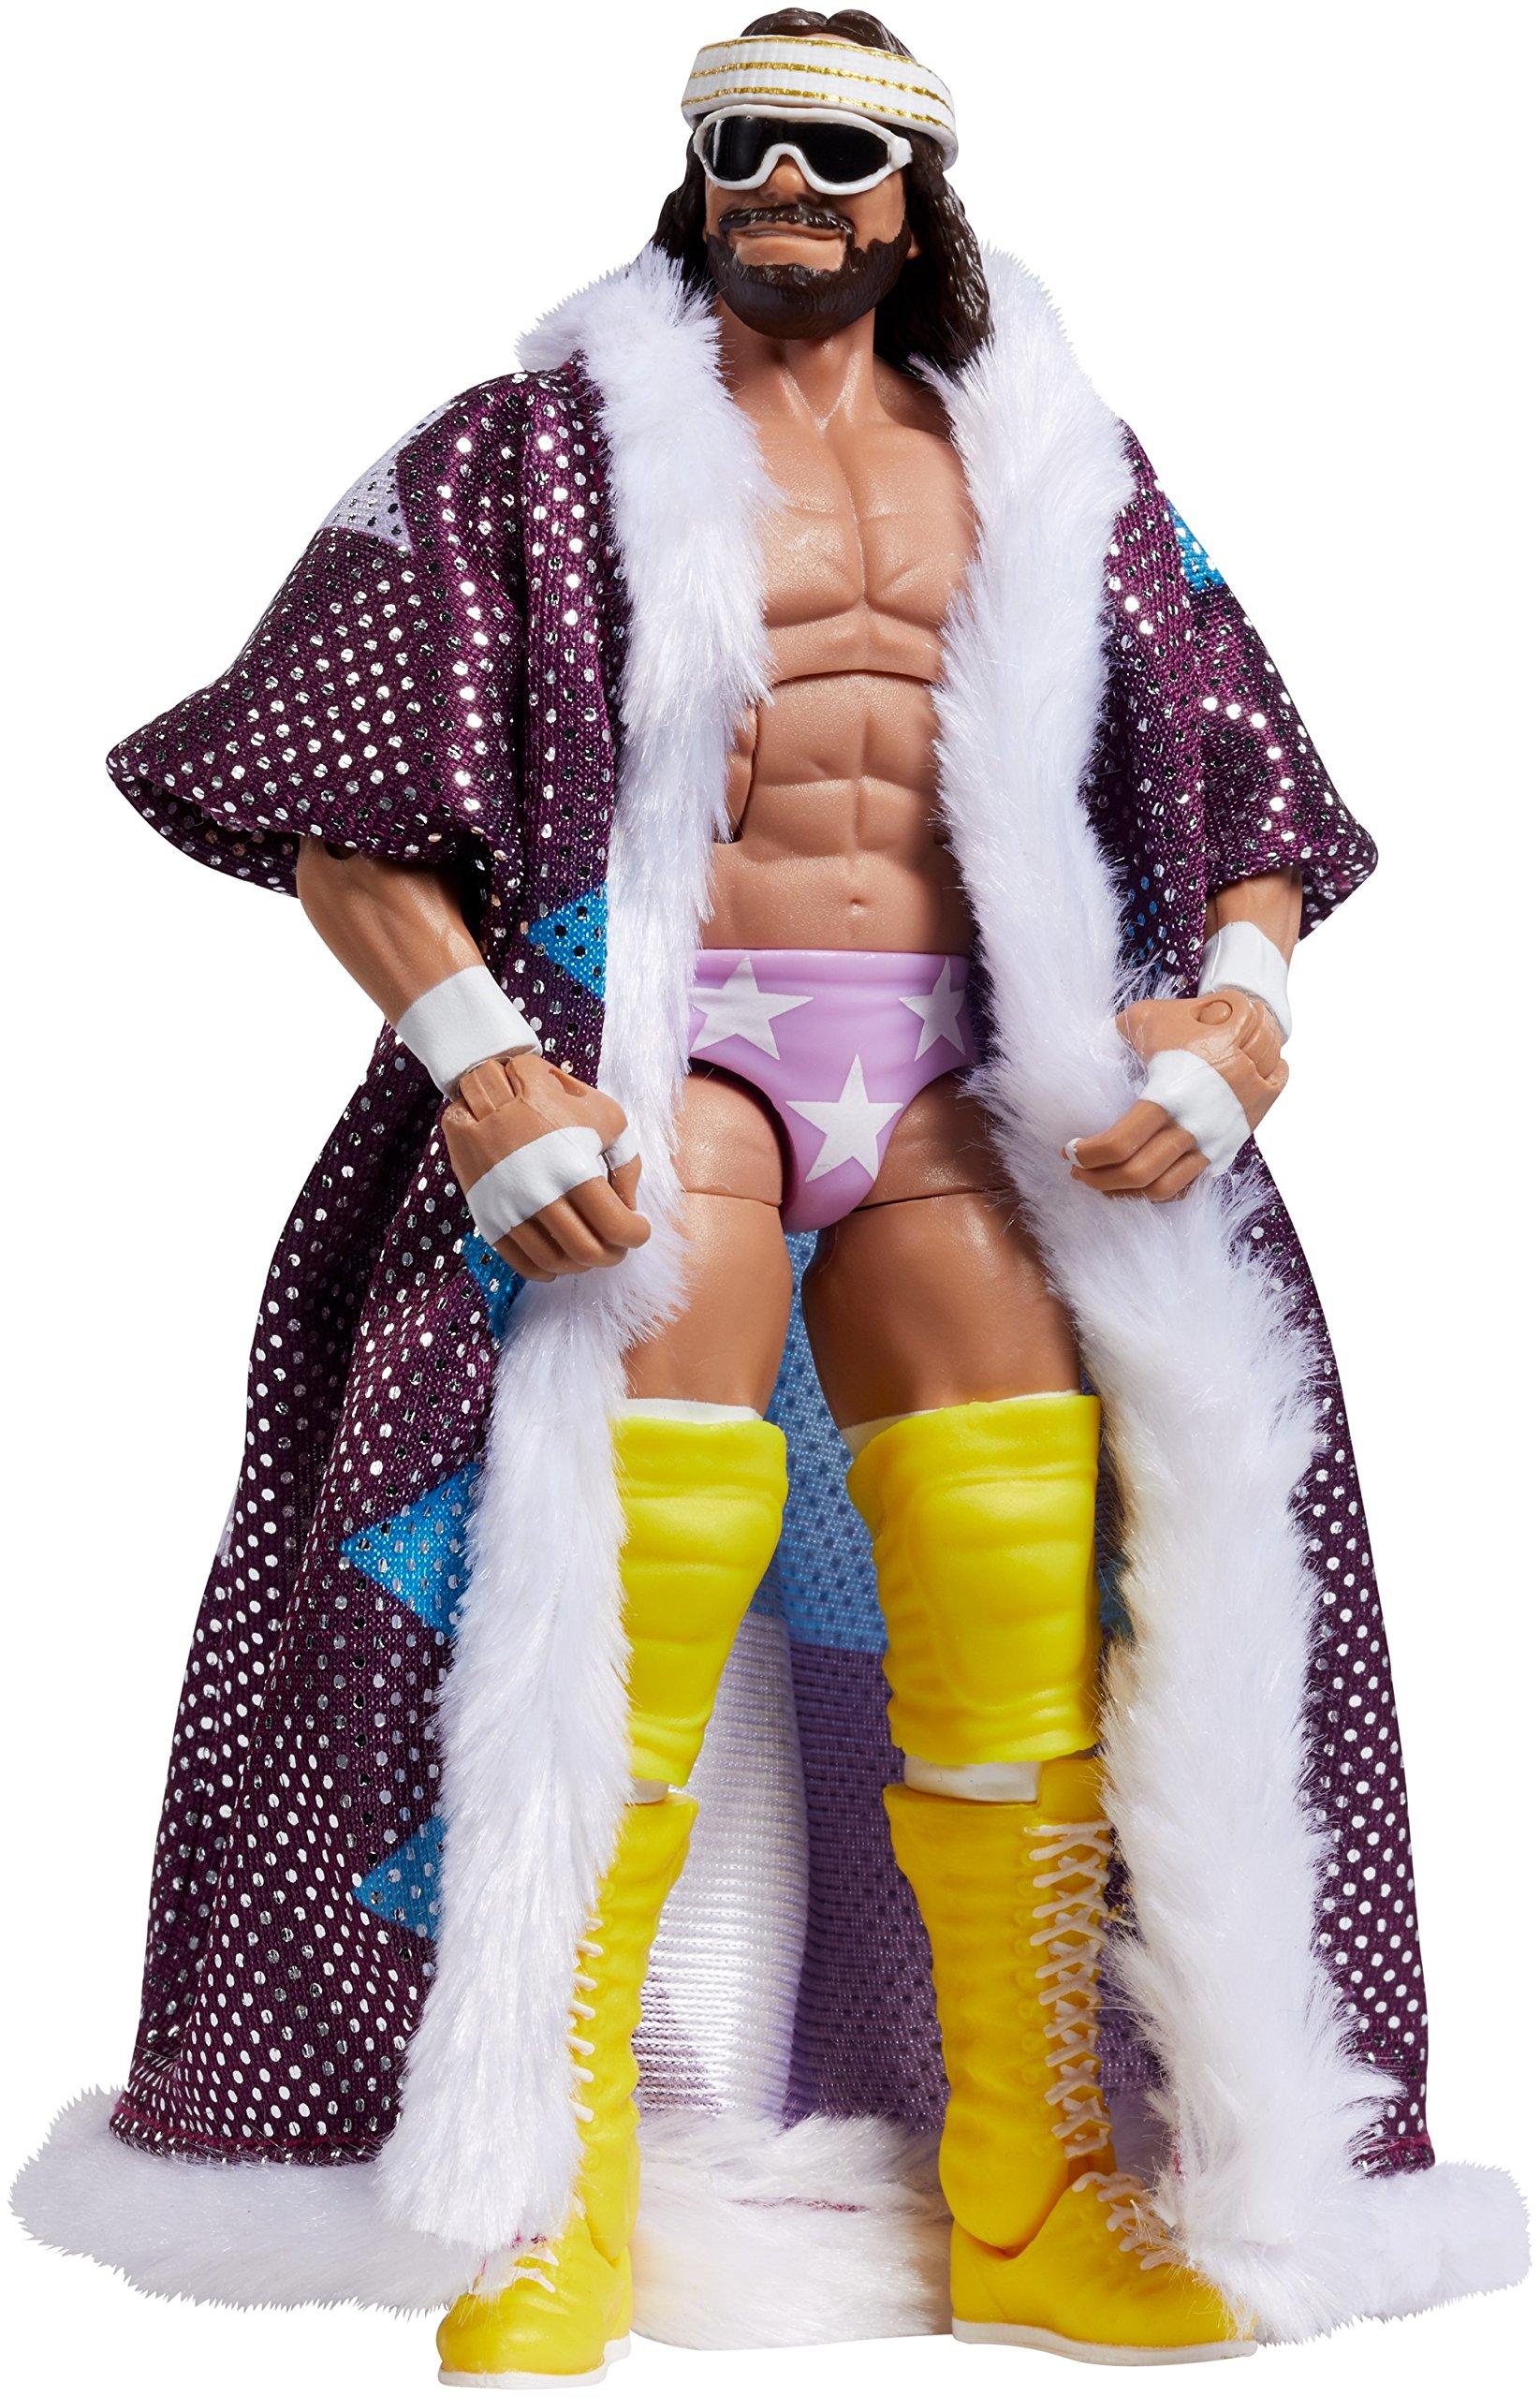 WWE Defining Moments Macho Man Randy Savage Action Figure